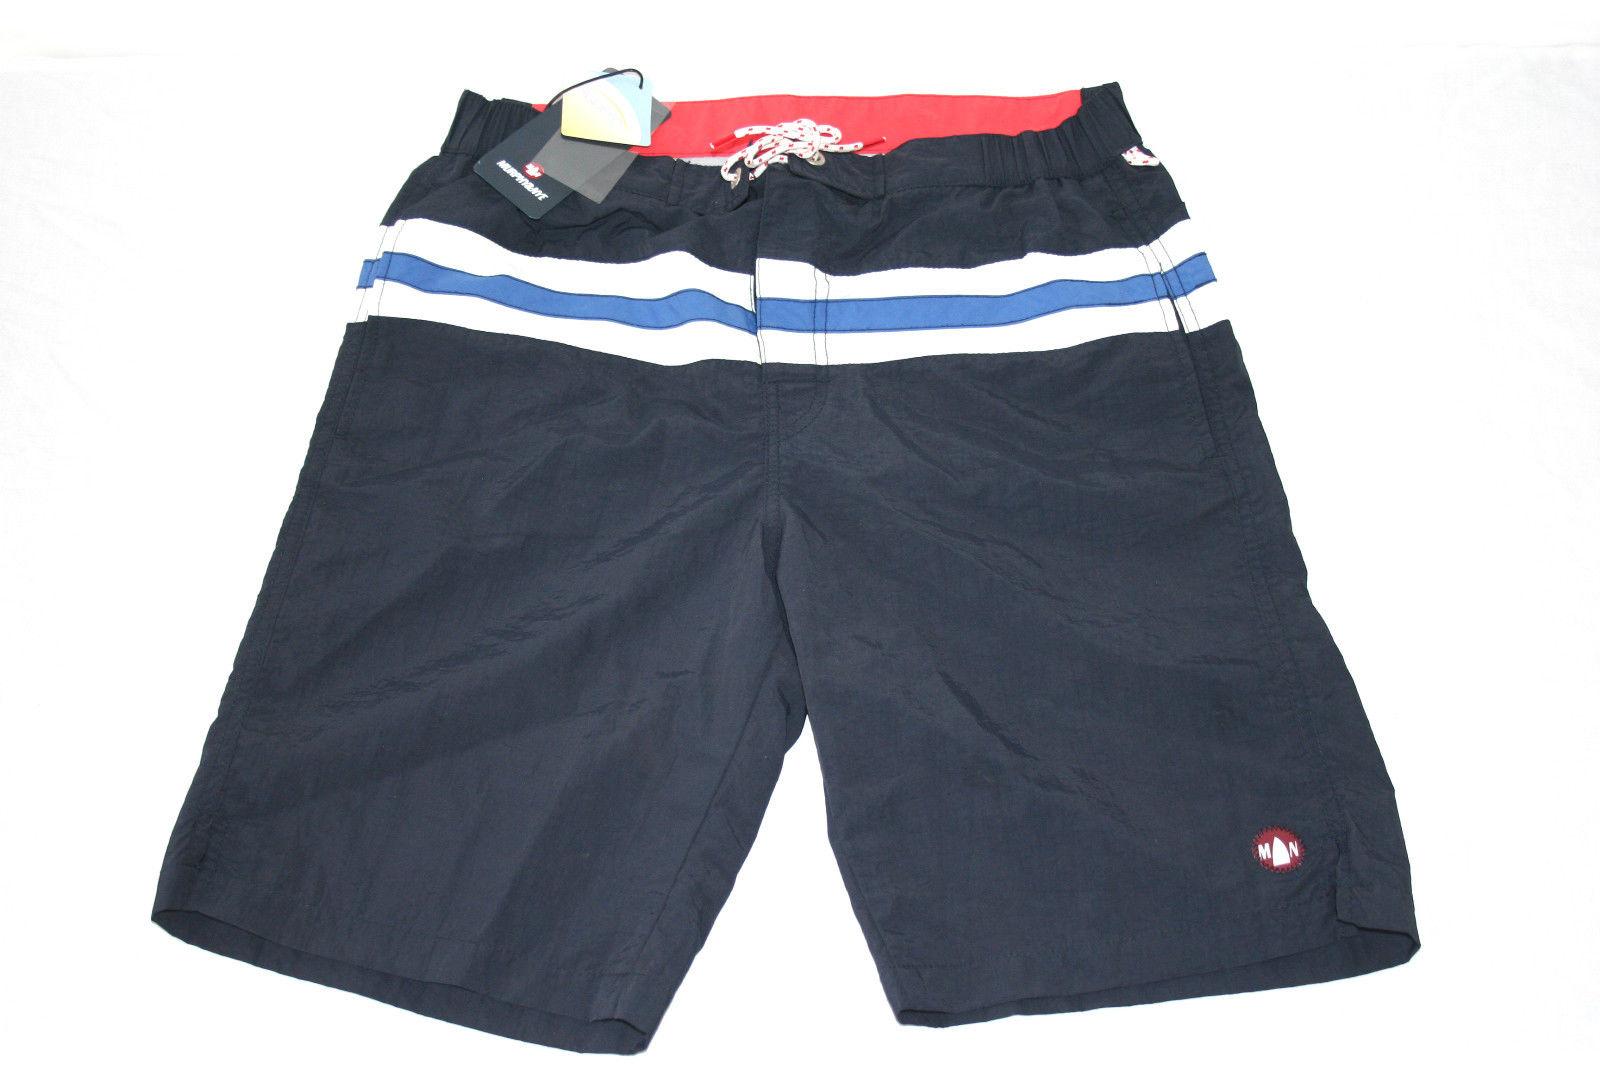 murphy-nye-mens-swimming-board-shorts